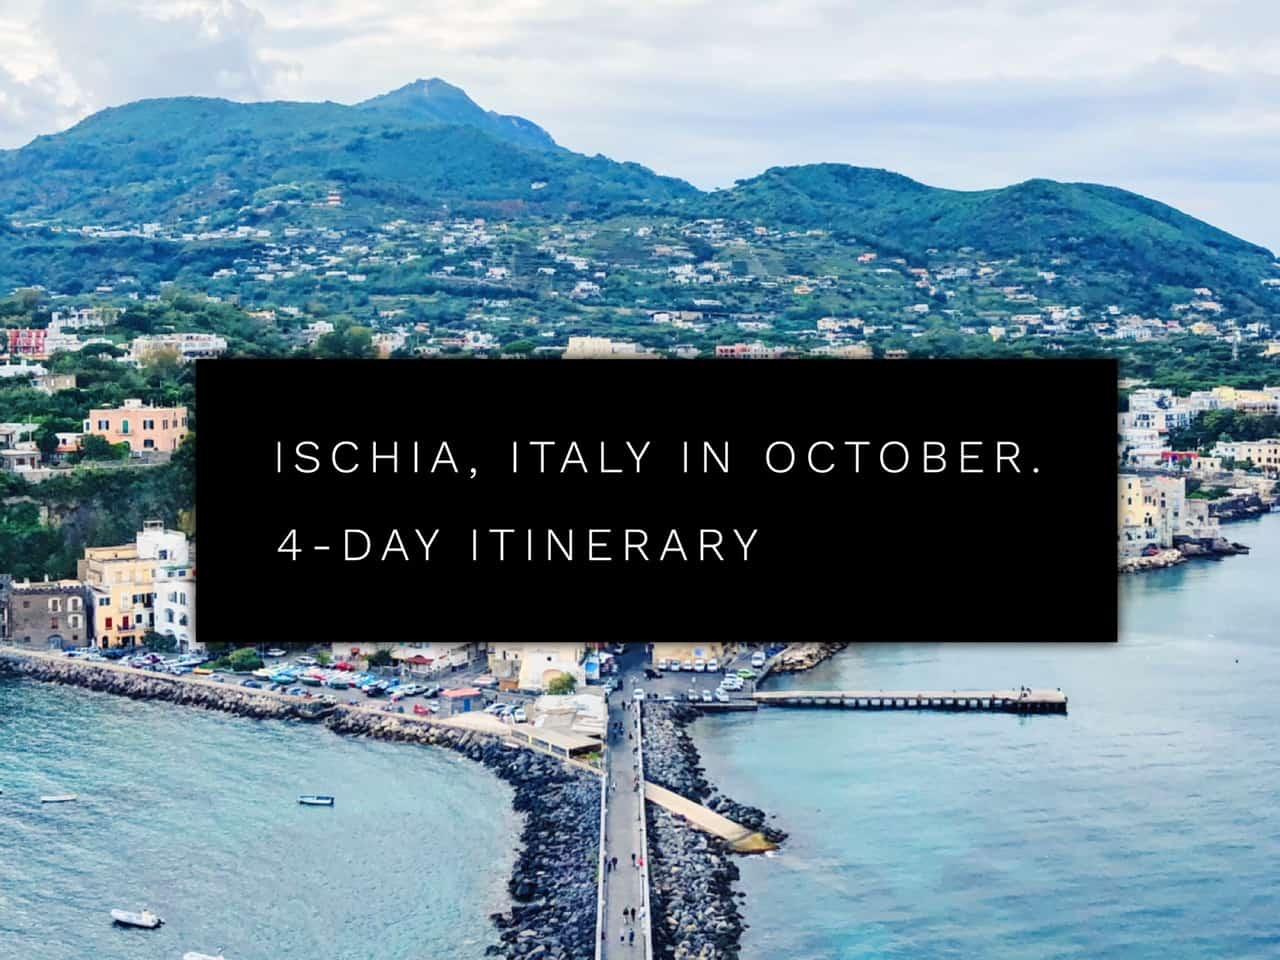 Ischia in October. 4 day itinerary in Ischia, Italy